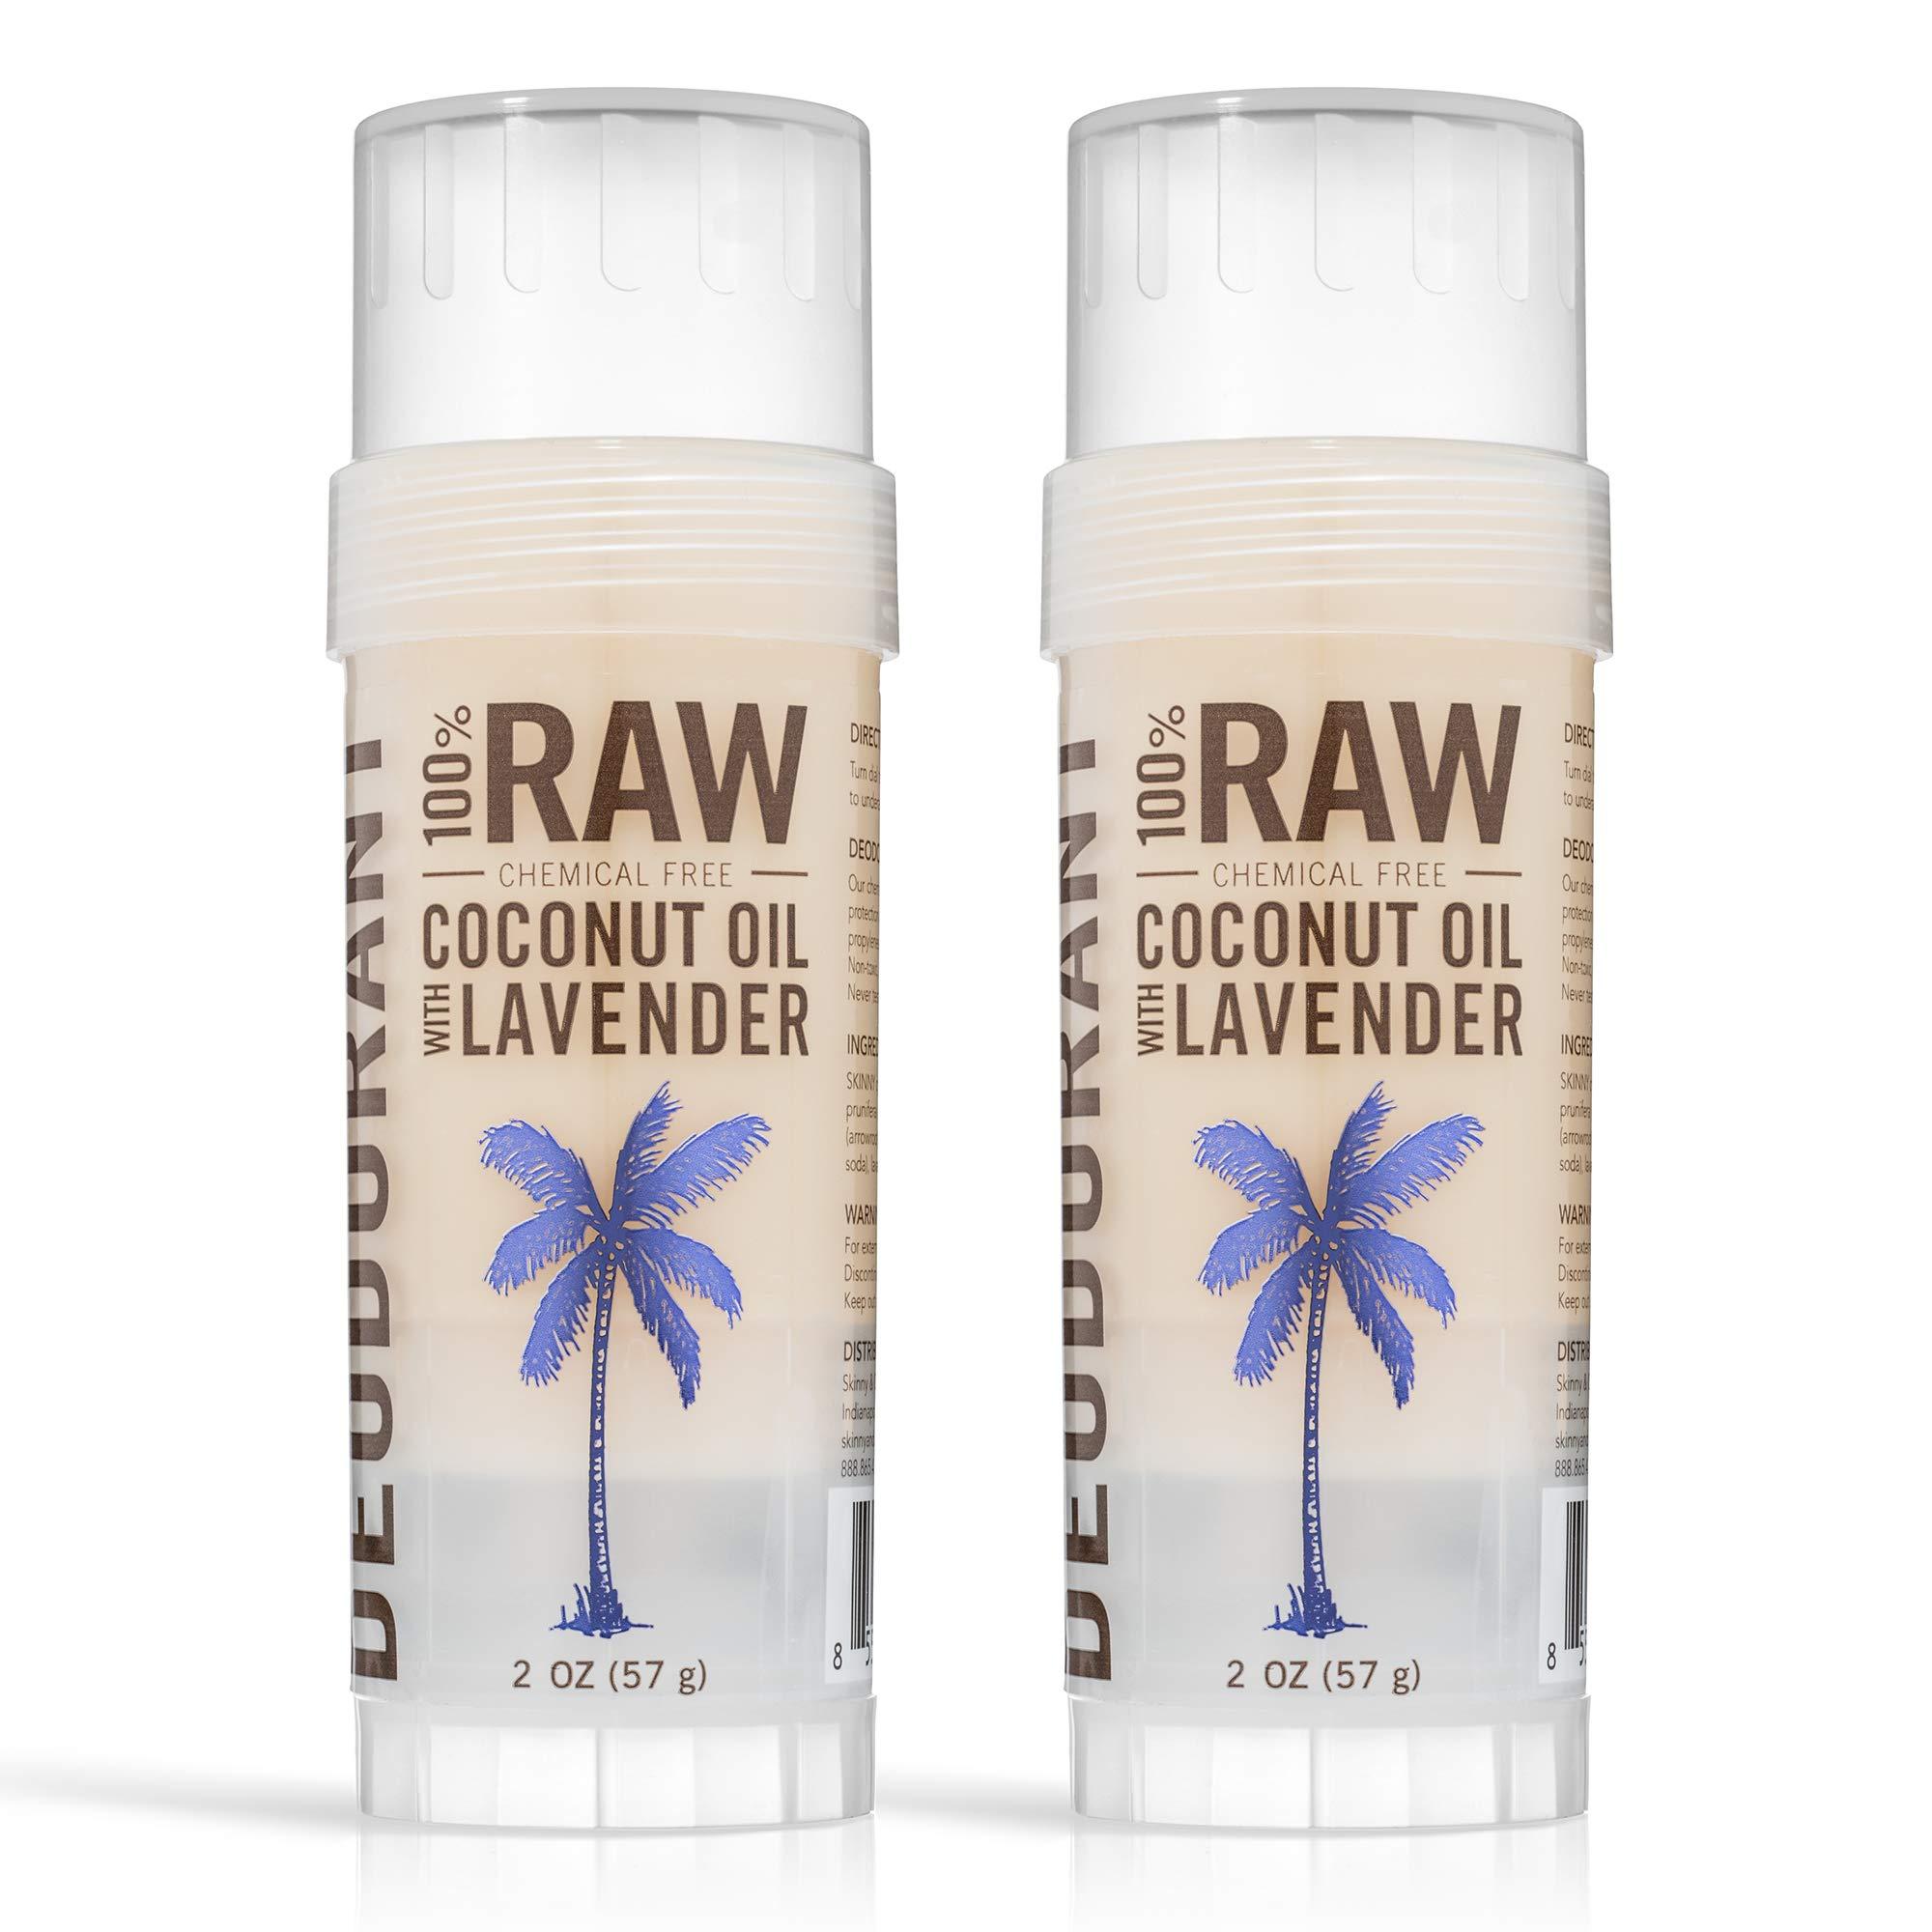 SKINNY & CO. 100% Pure Coconut Oil with Lavendar Deodorant- Anti-odor, Antibacterial, Fast Absorbing, Soothes Skin, Vegan, Aromatherapeutic Properties, Aluminum & Paraben Free, 2 oz. (2 pack)